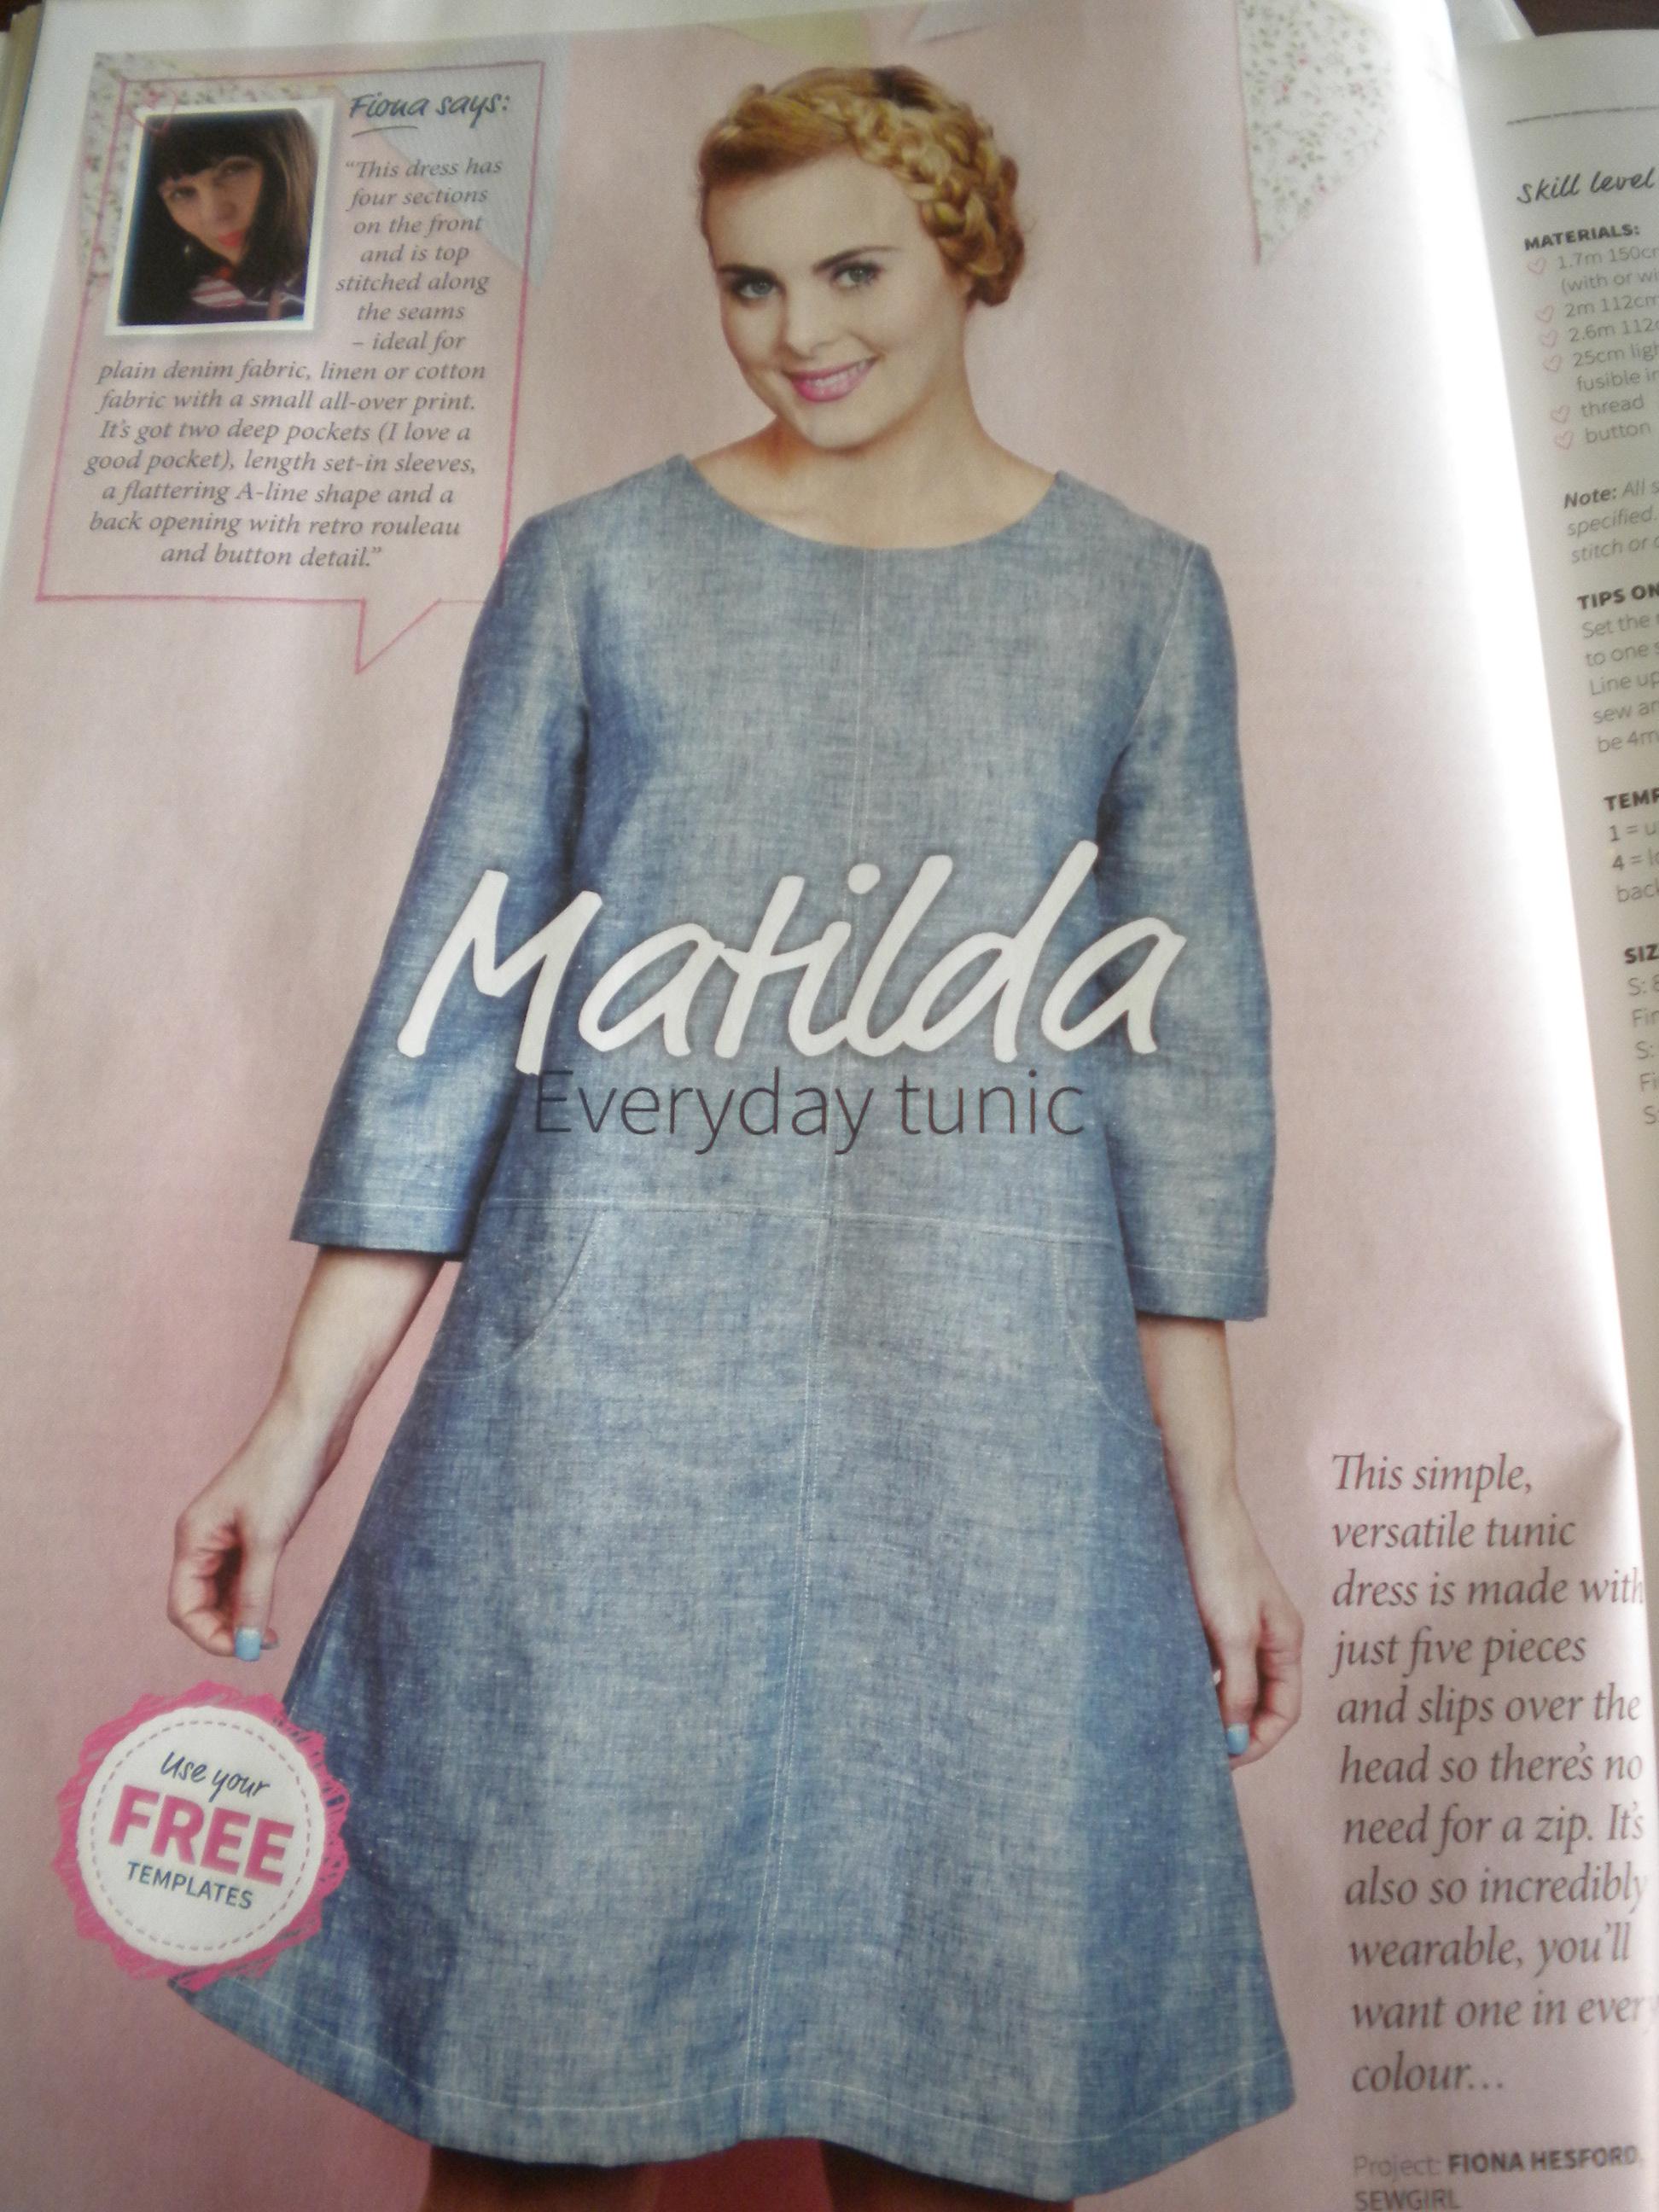 Matilda Tunic Dress | All My Own Work By Ann